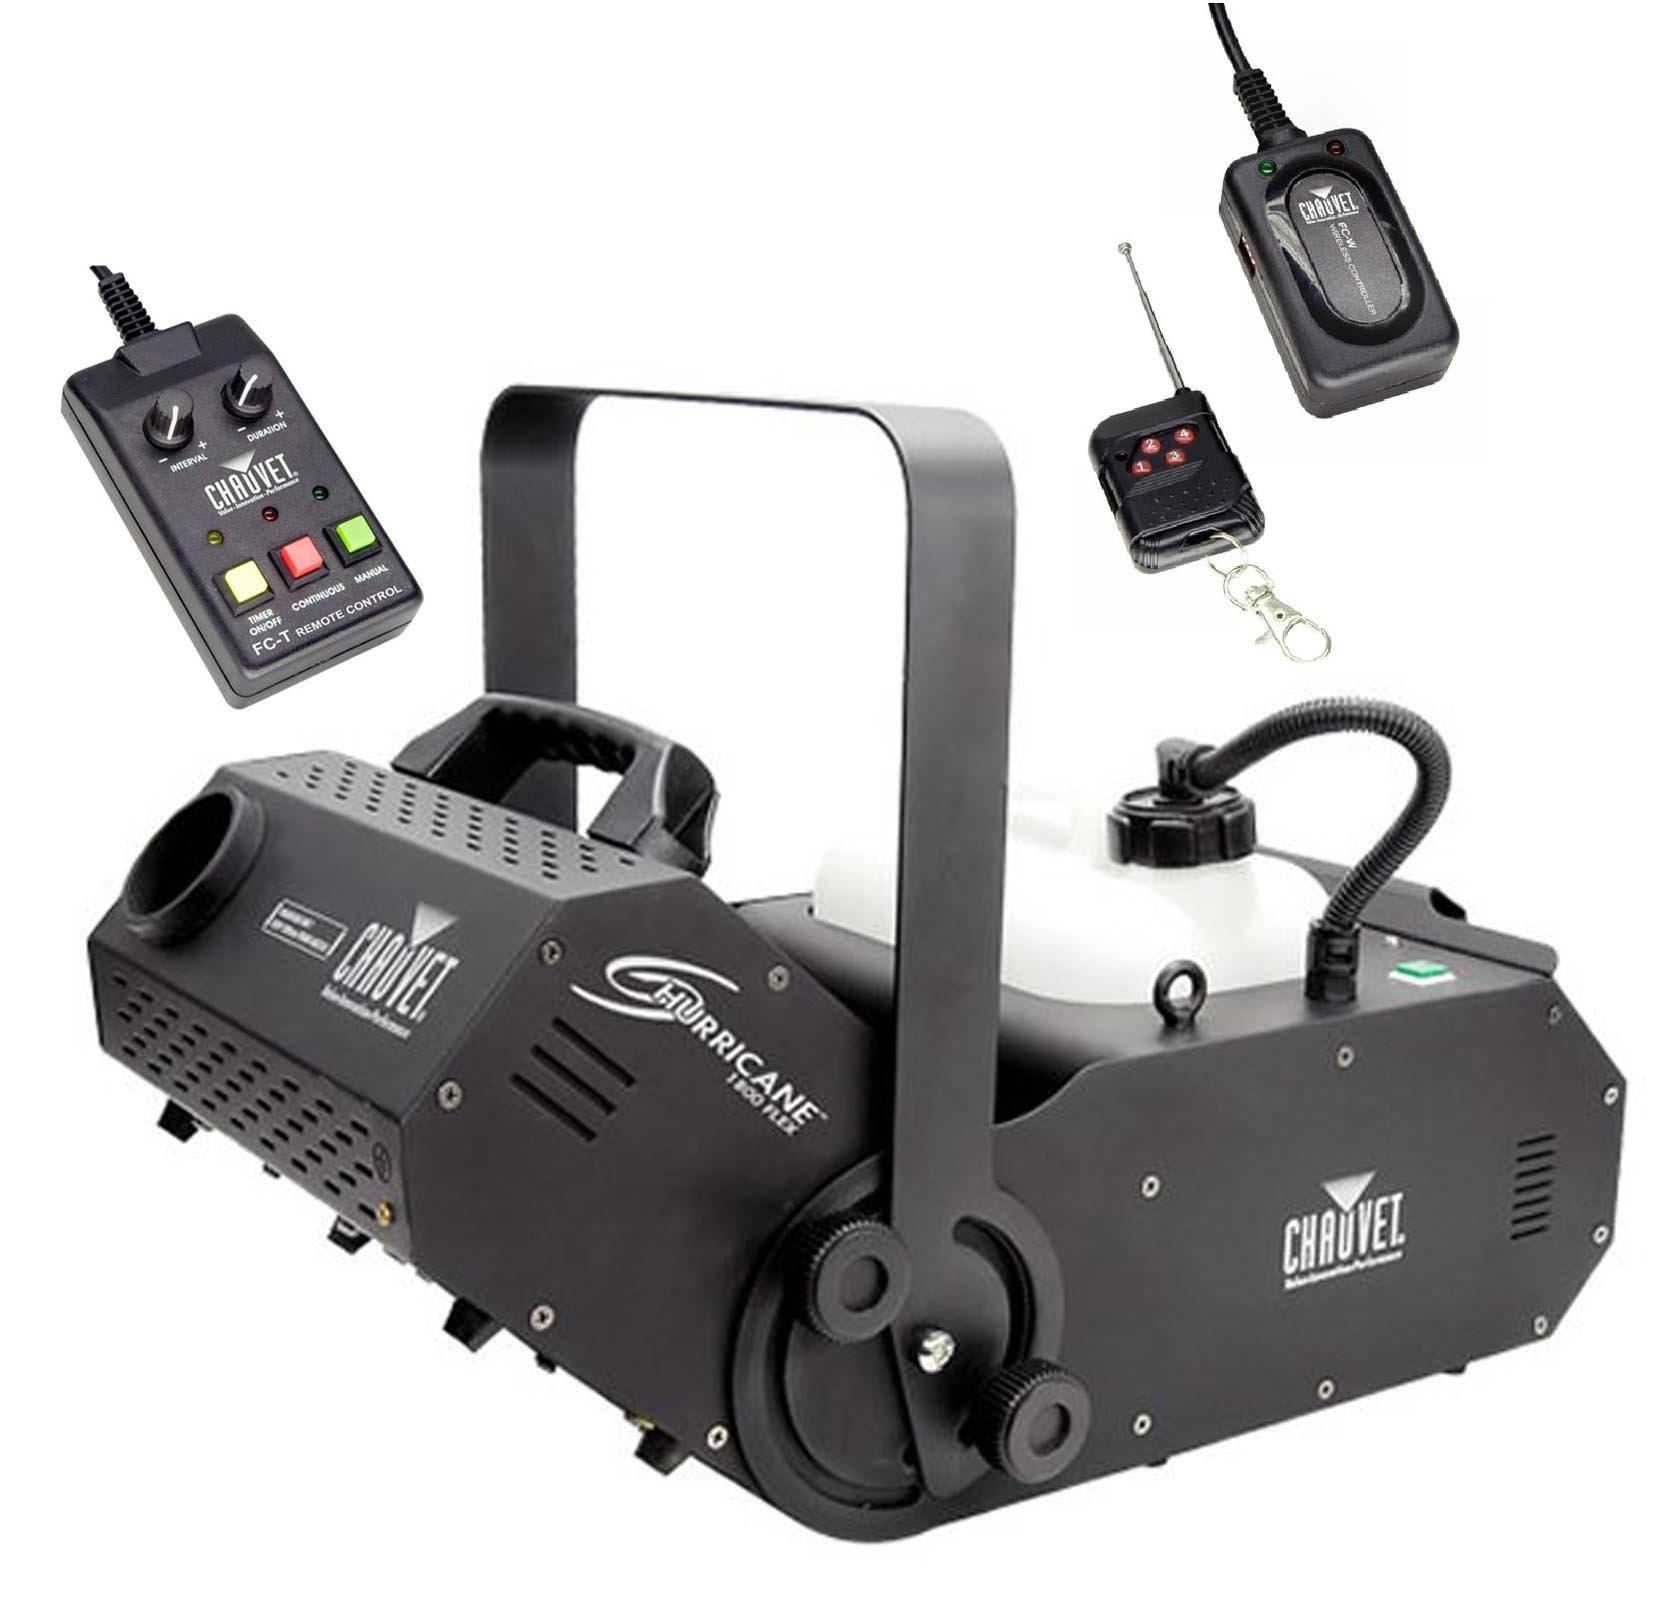 NEW! CHAUVET HURRICANE H1800 FLEX Fog/Smoke Pro Machine w/ FC-W Wireless Remote